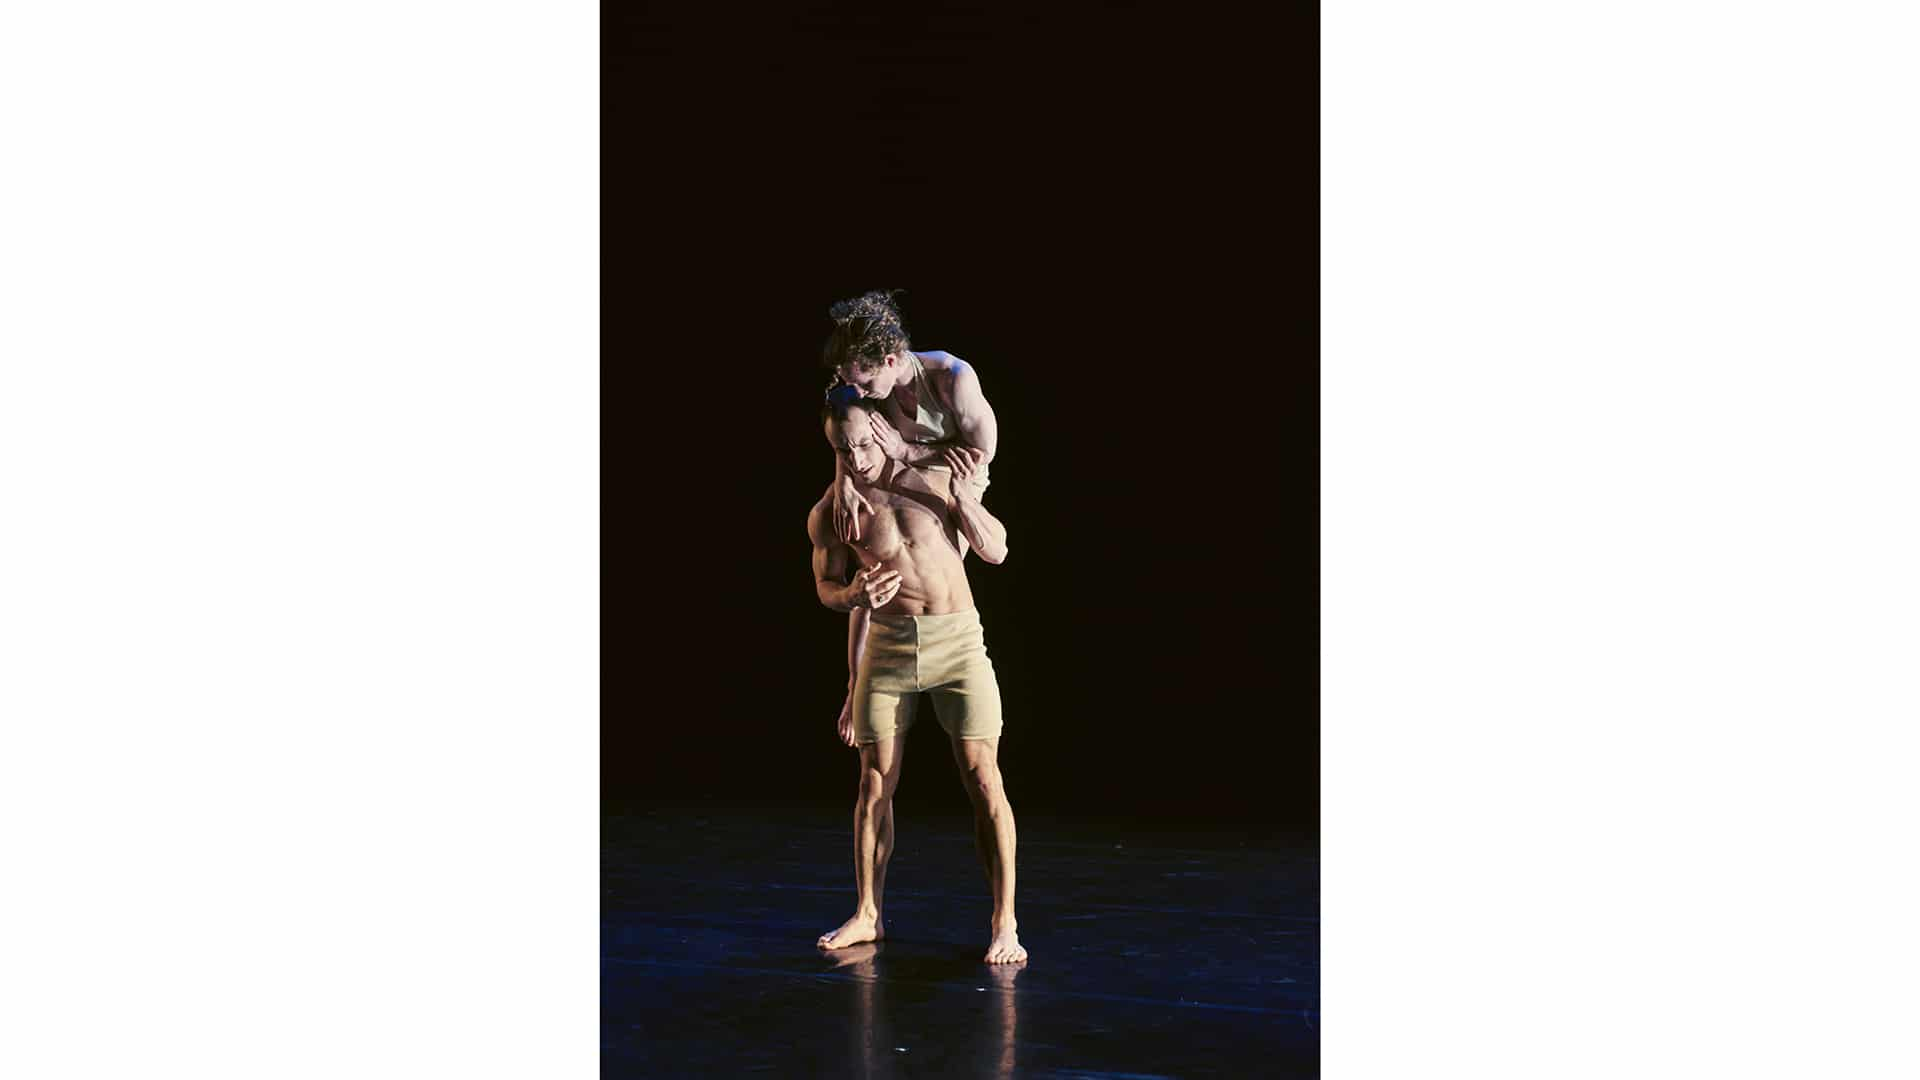 JD Broussé carries Nikki Rummer on his back